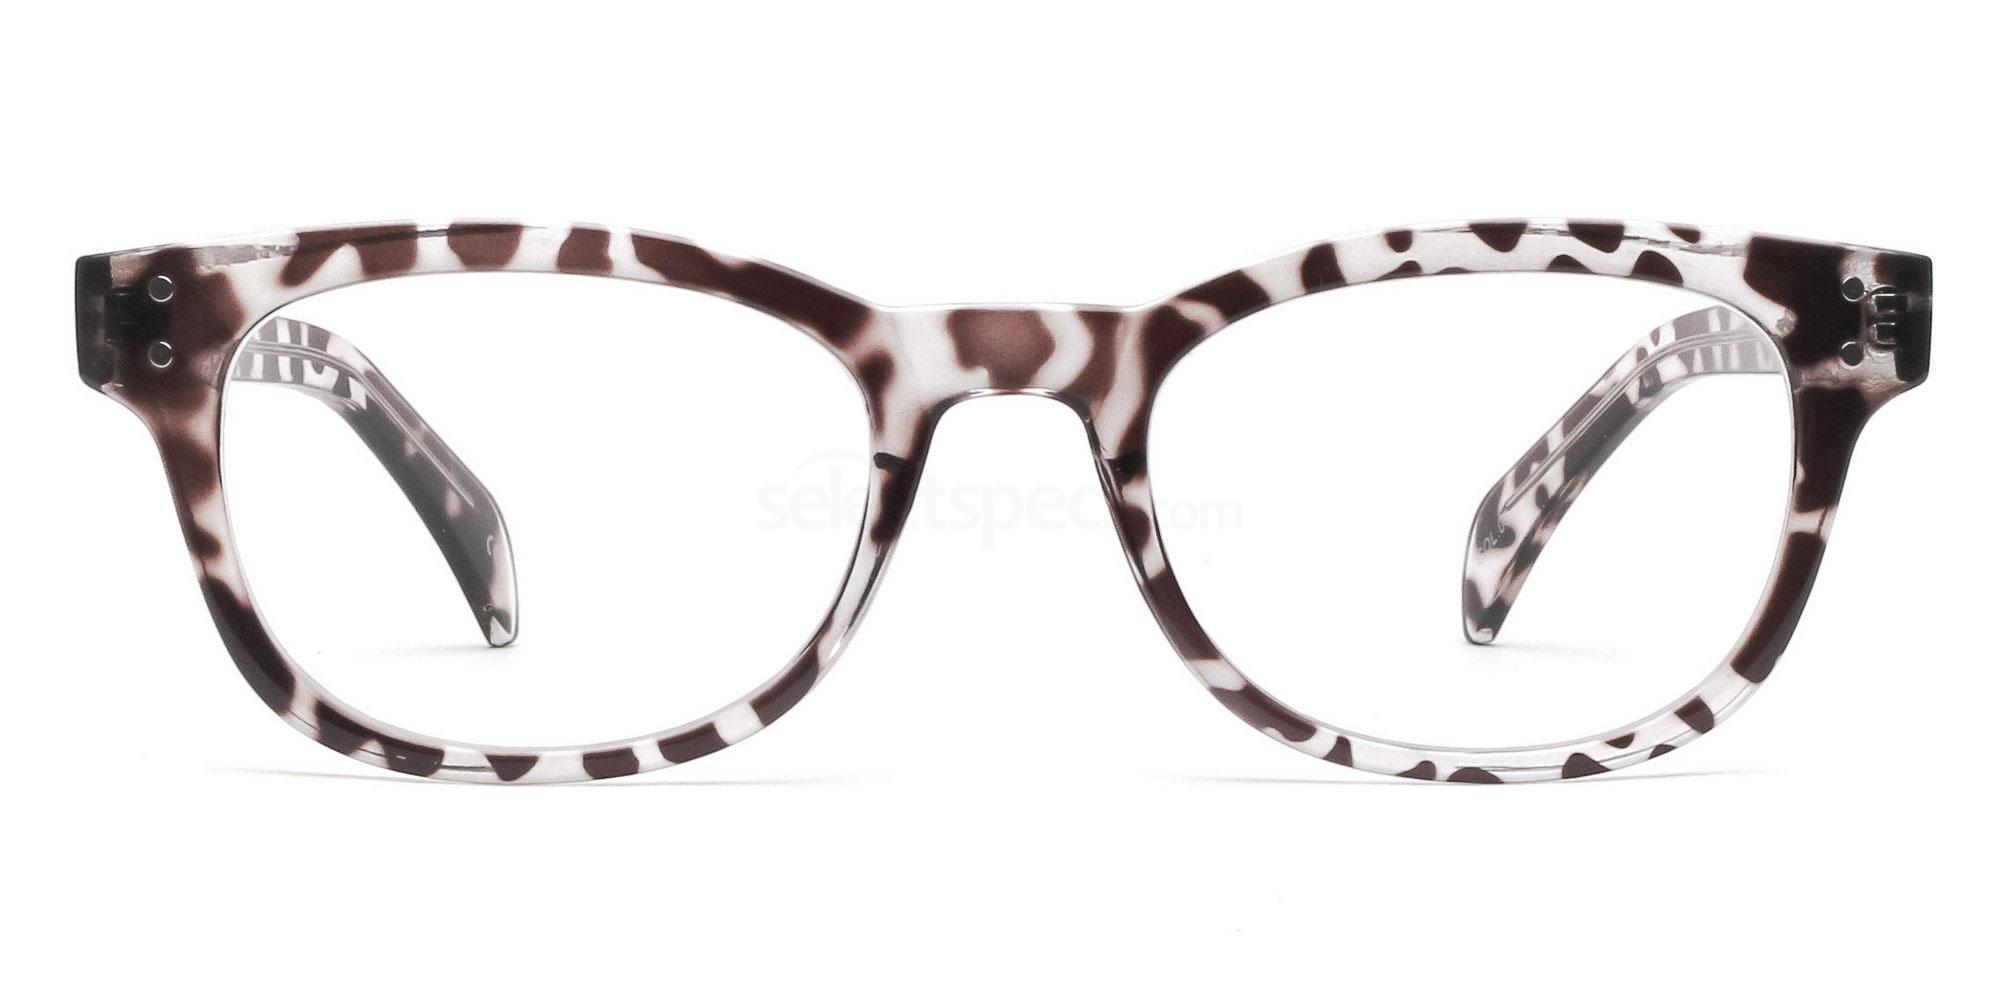 Col.03 2249 Animal Print Glasses, Savannah